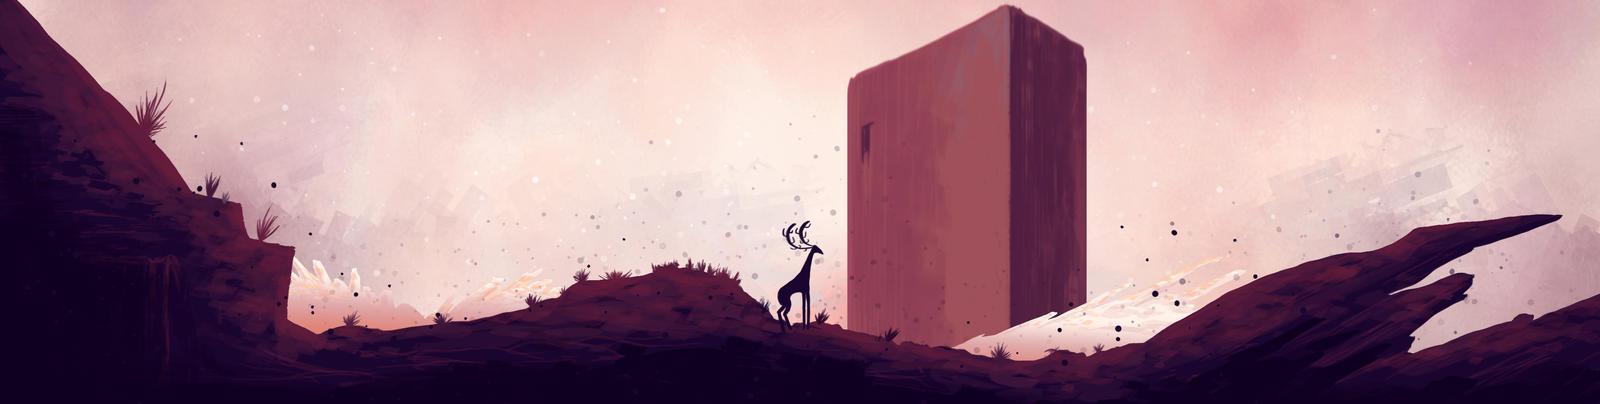 Deer on Earth ! by LeyssenotG